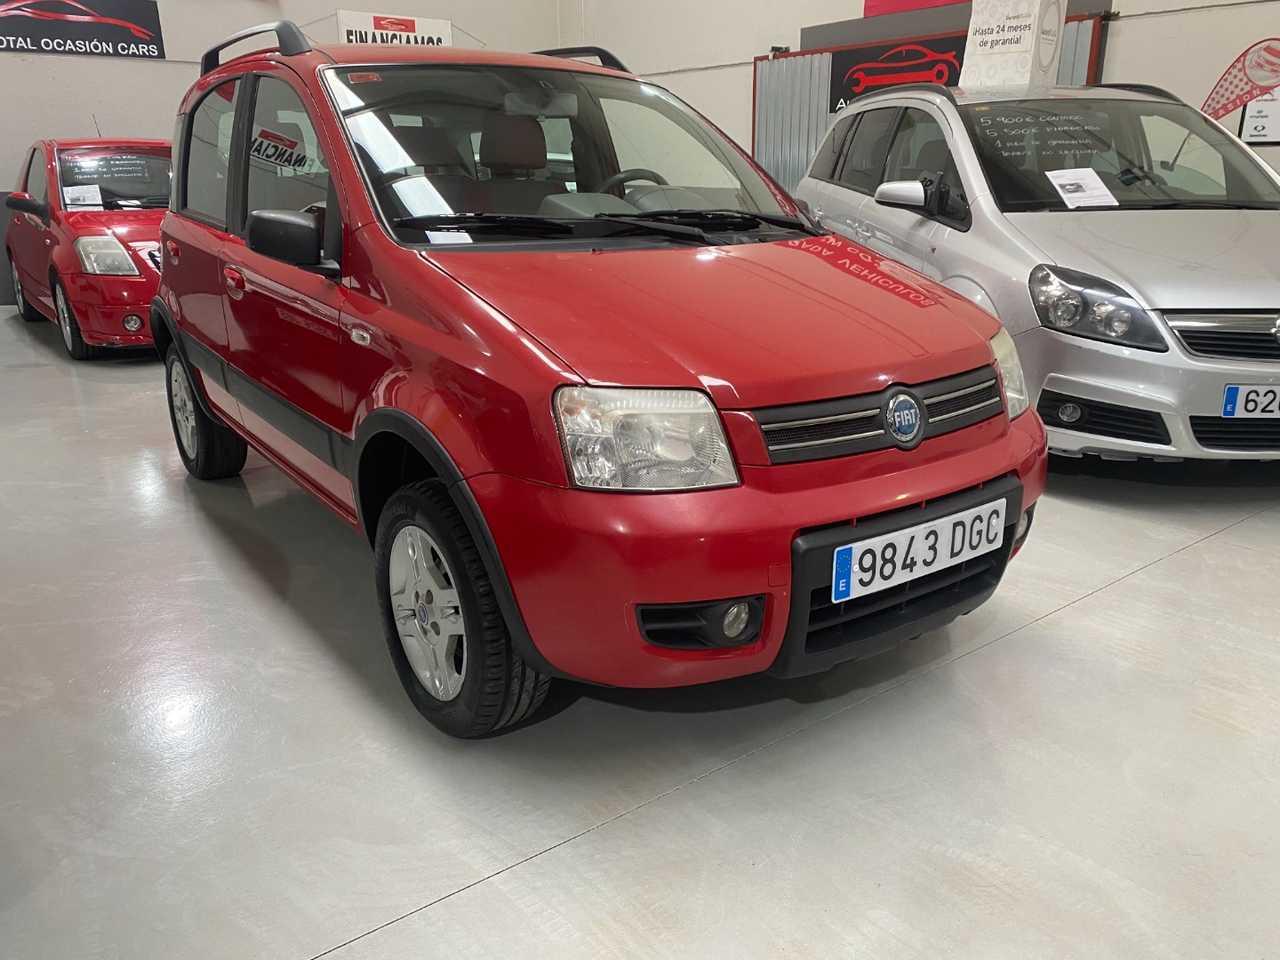 Fiat Panda 4x4 FIAT Panda 1.2 4x4 5p.   - Foto 1